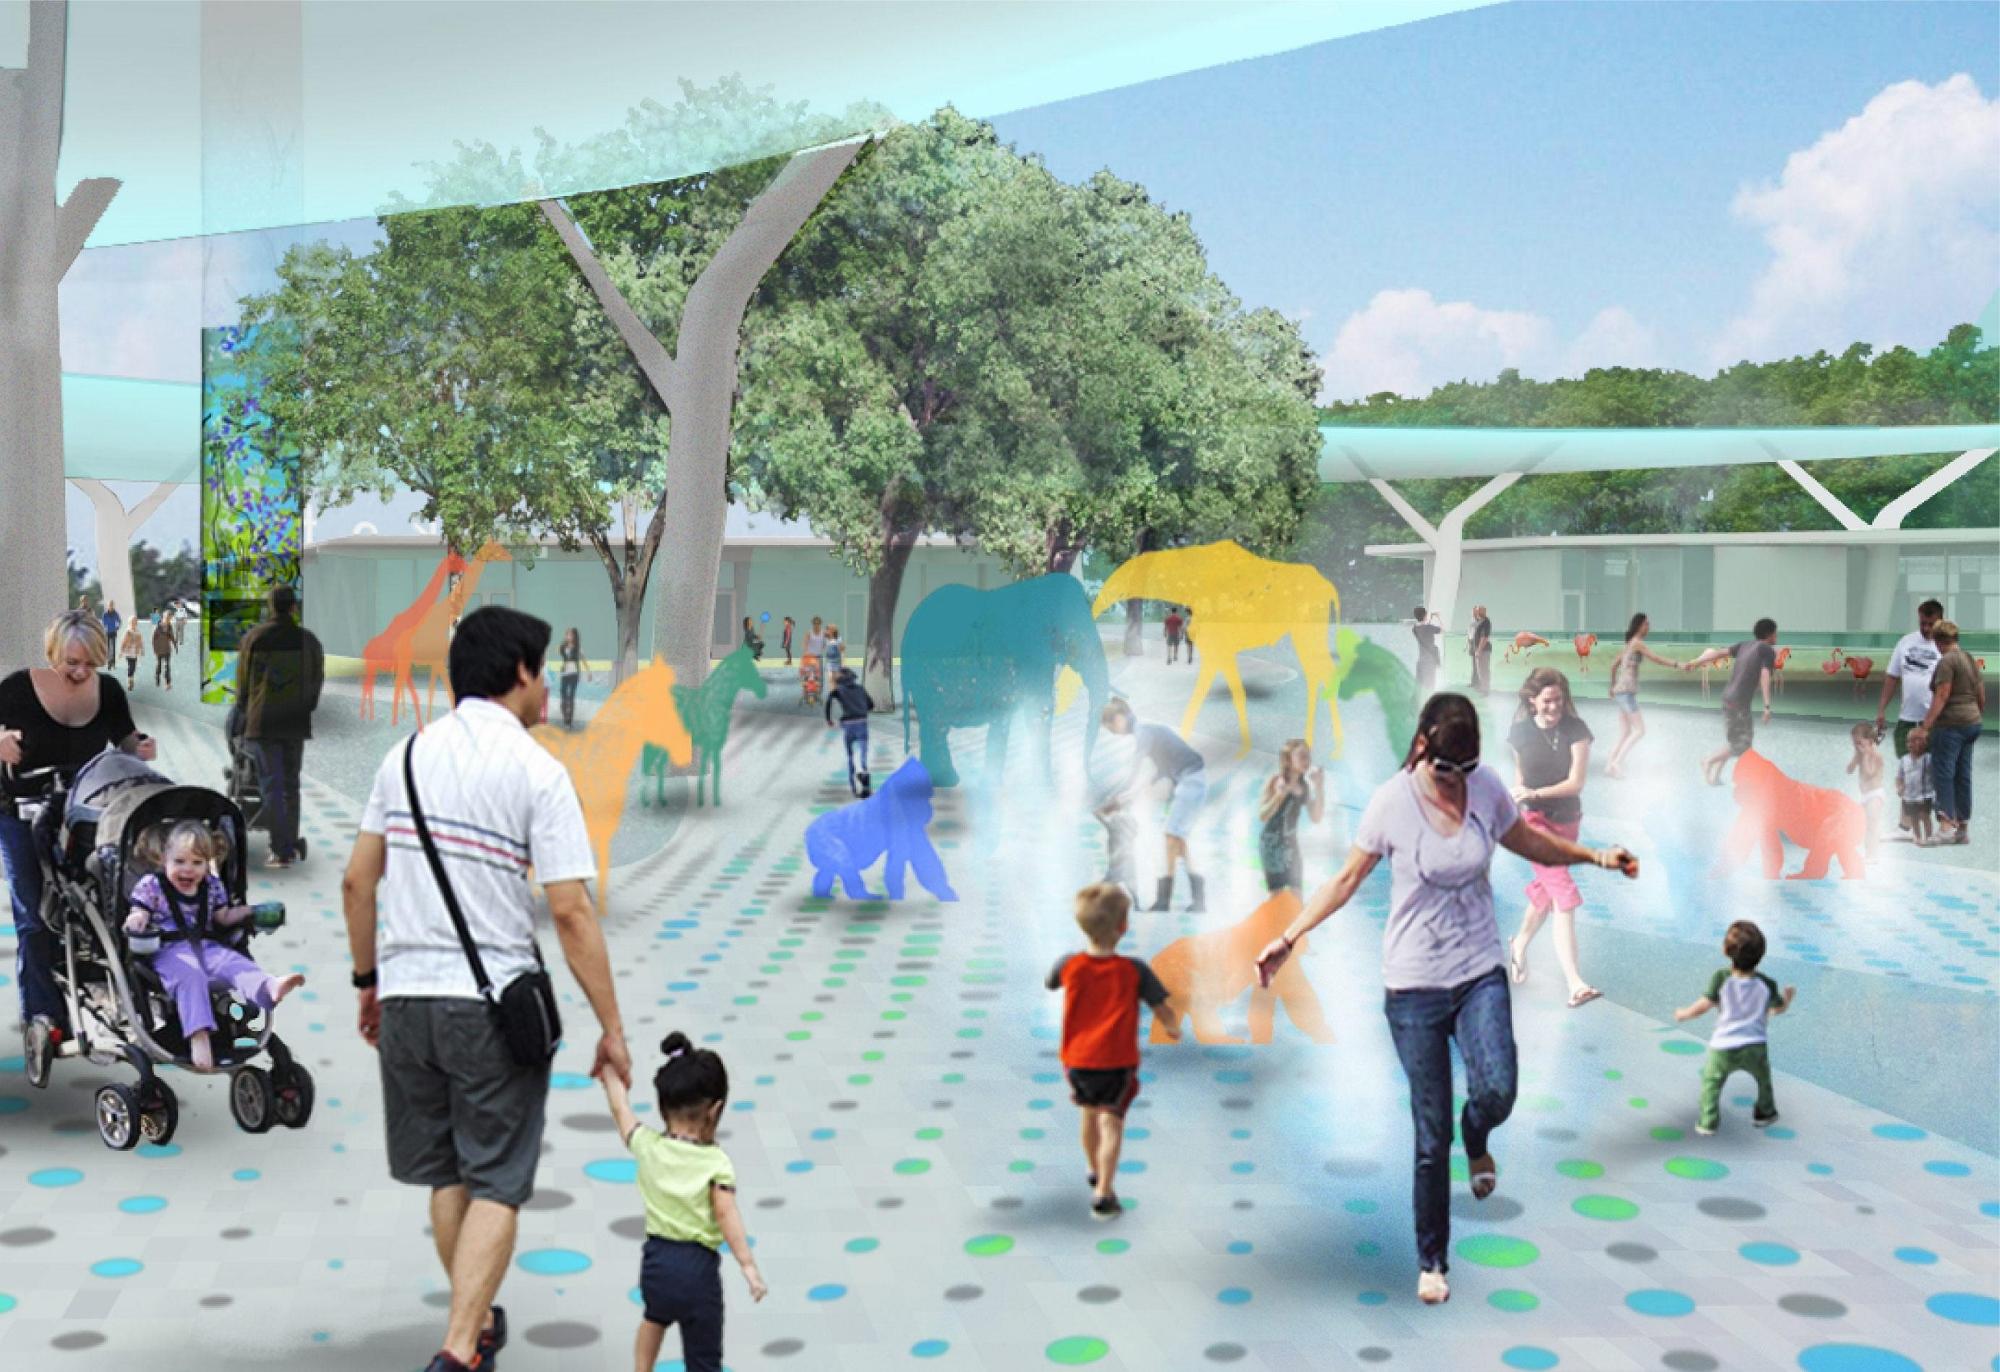 zoo miami prepares for opening of new florida mission everglades exhibit